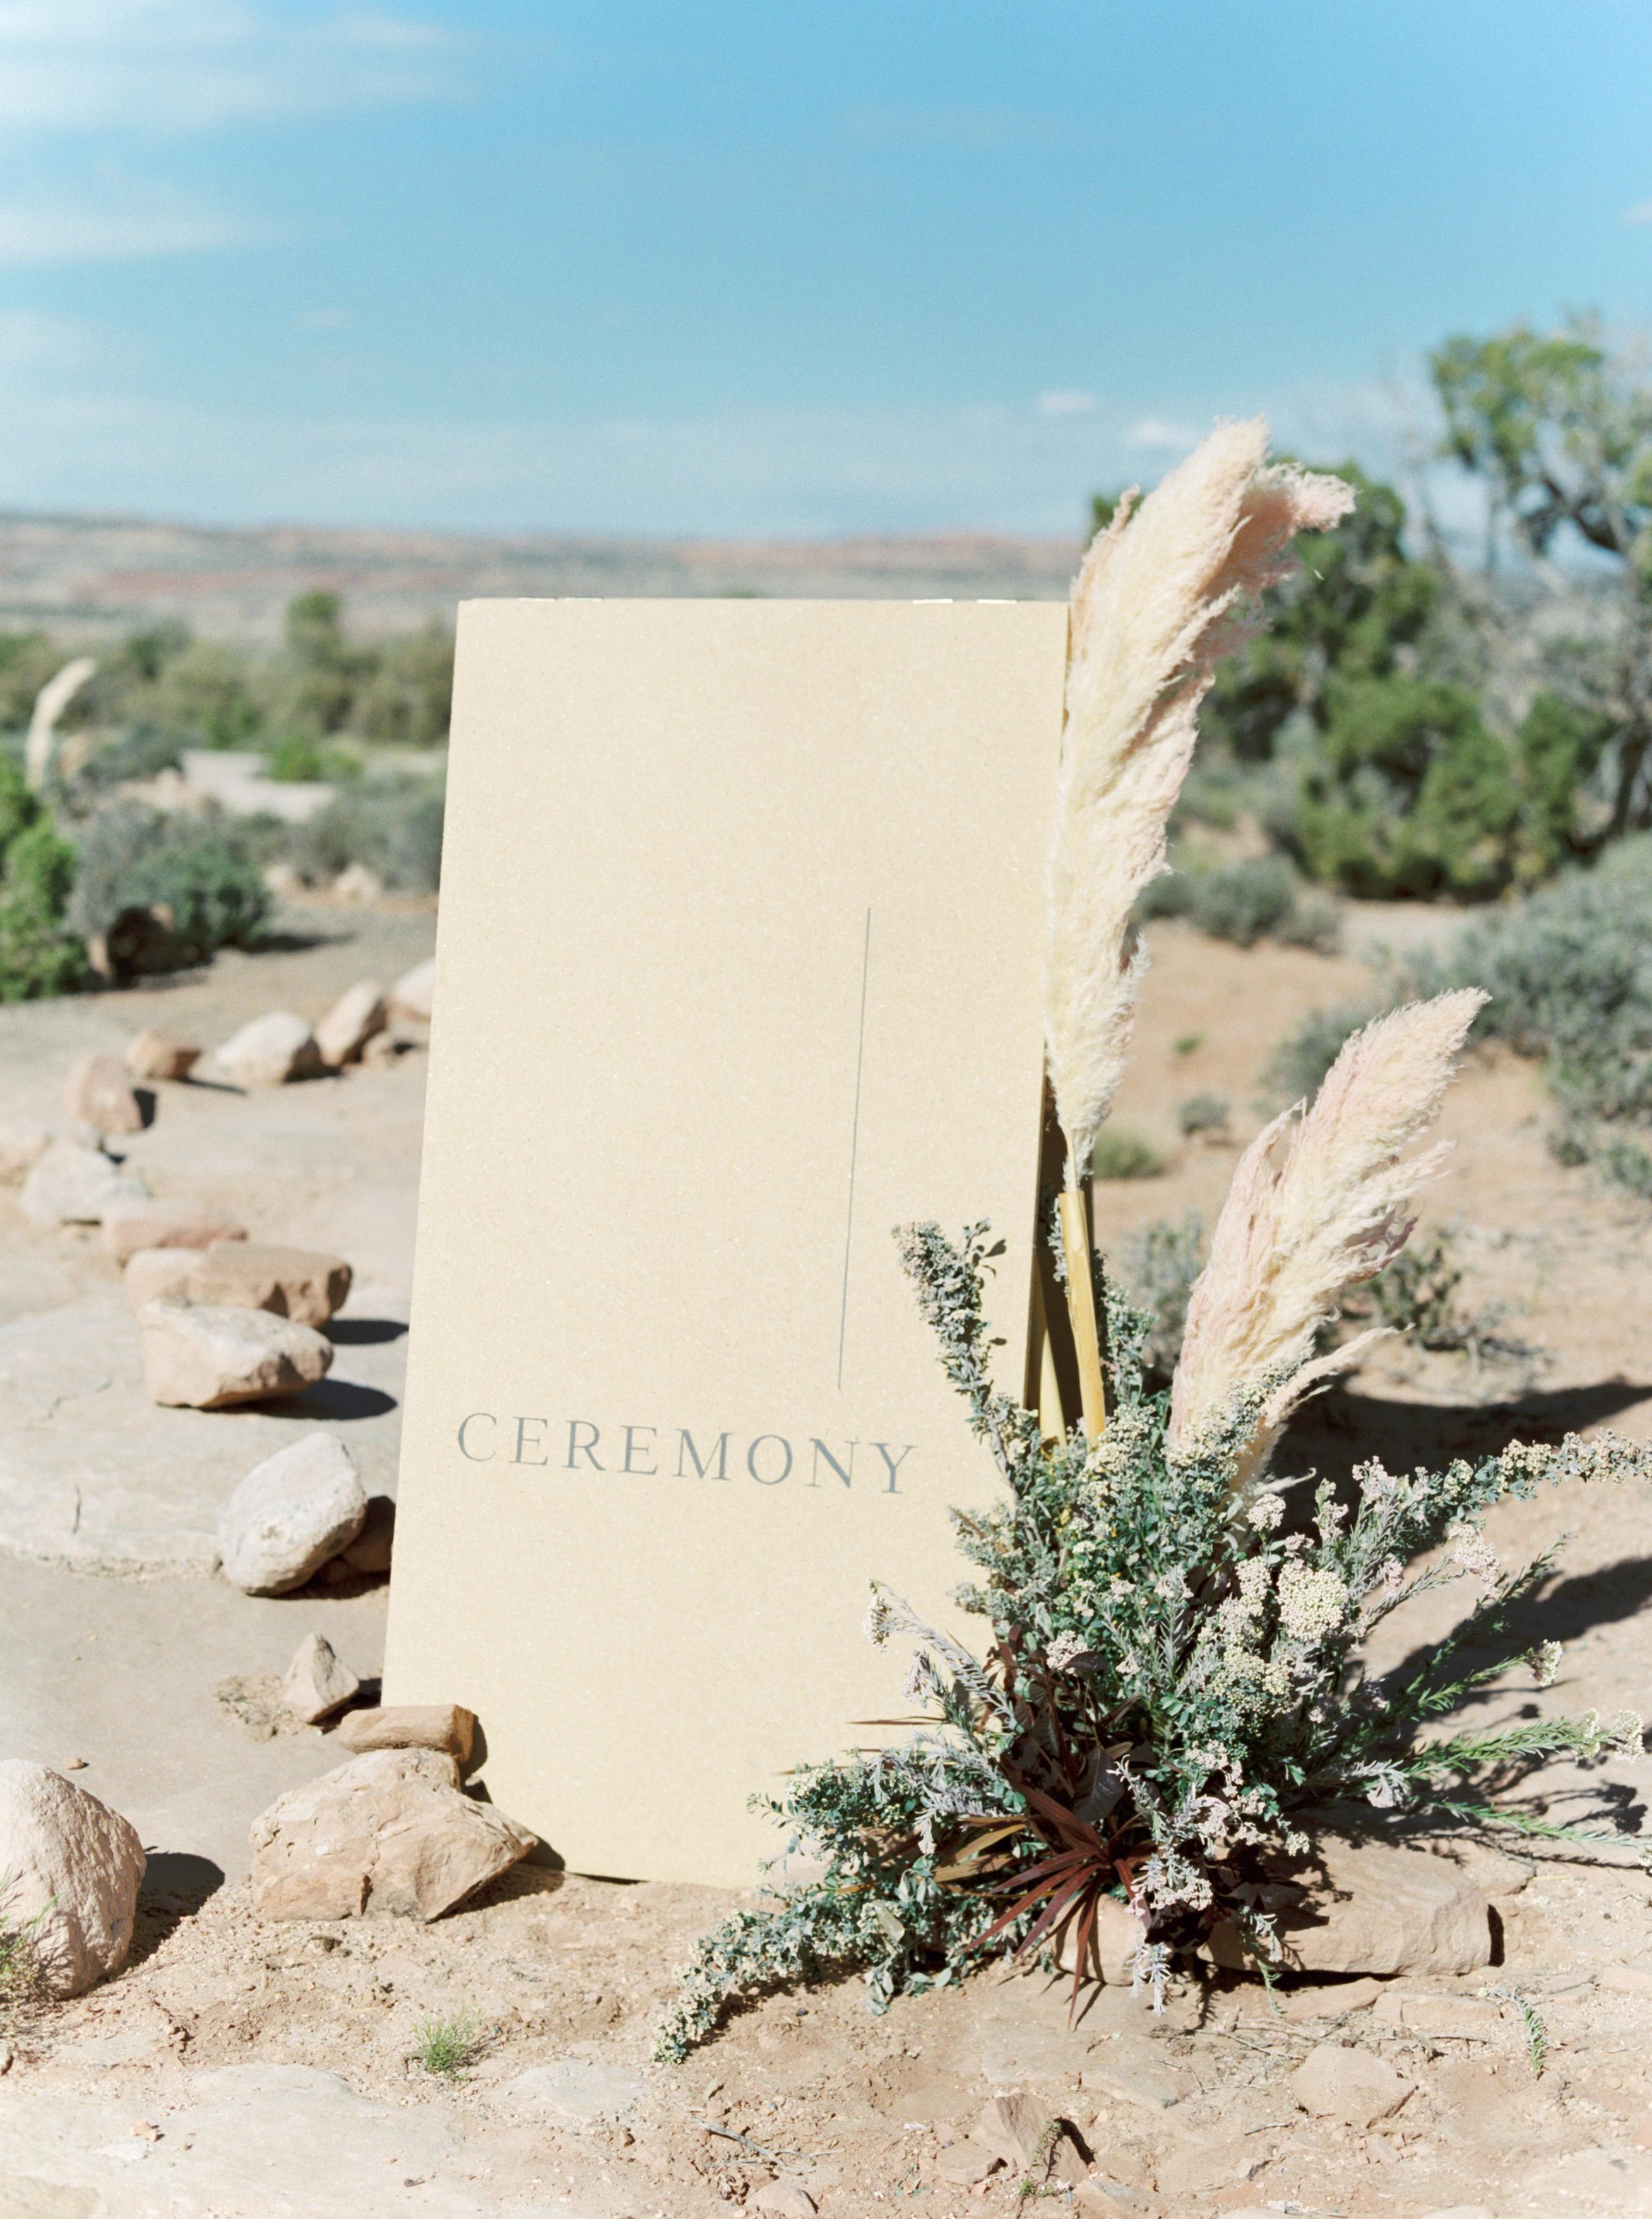 jeanette david wedding desert ceremony site sign